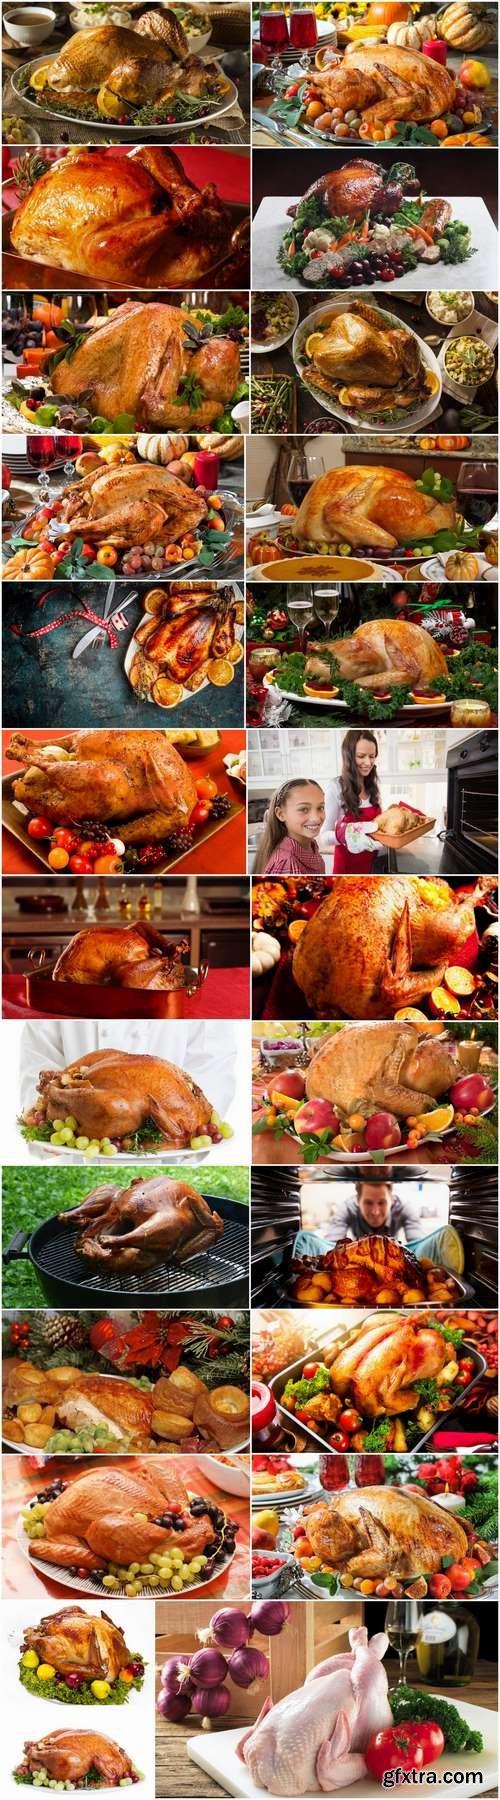 Roast turkey gobbler hen holiday dish 25 HQ Jpeg